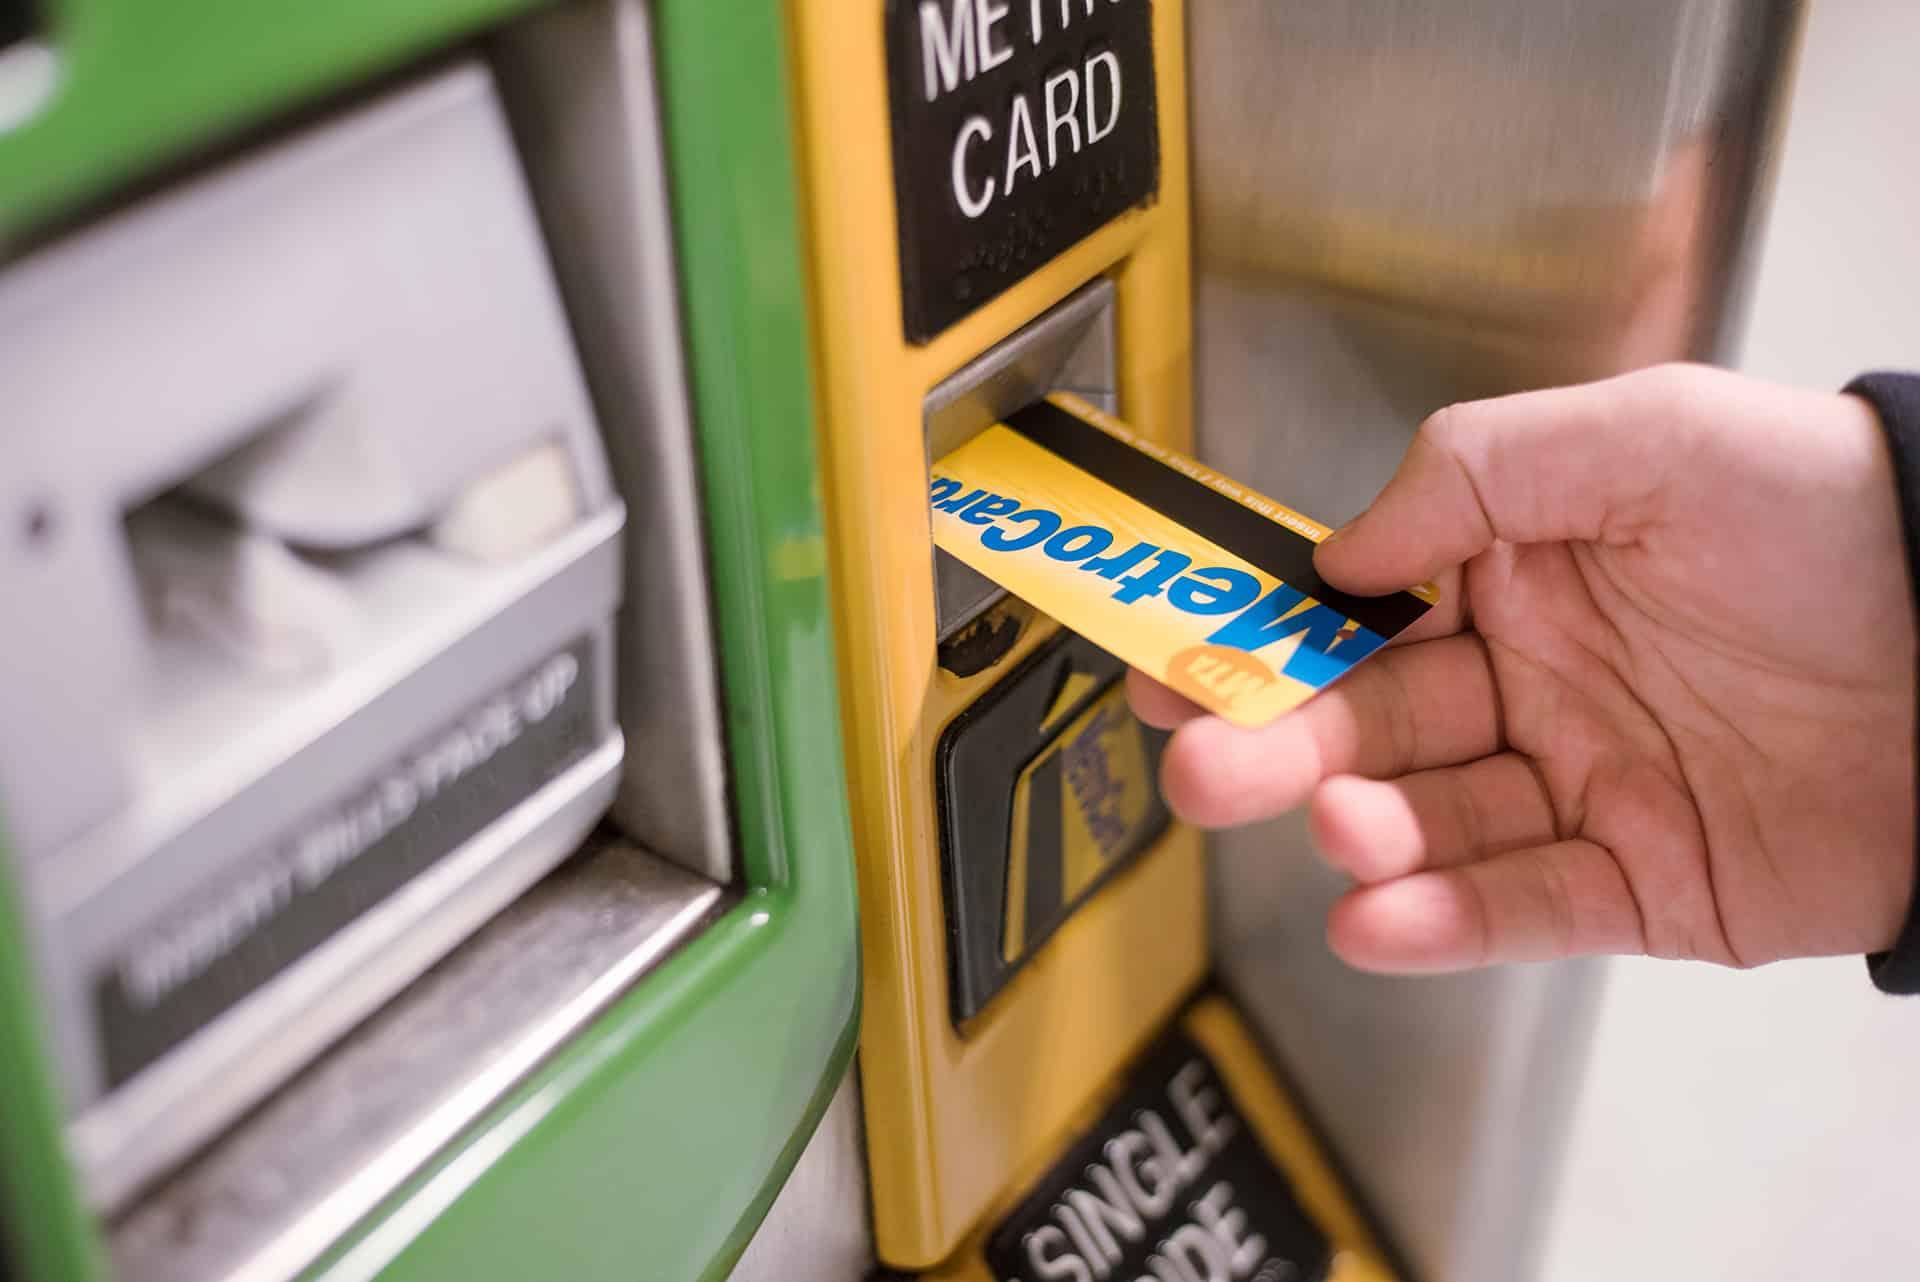 tarifs metrocard NY